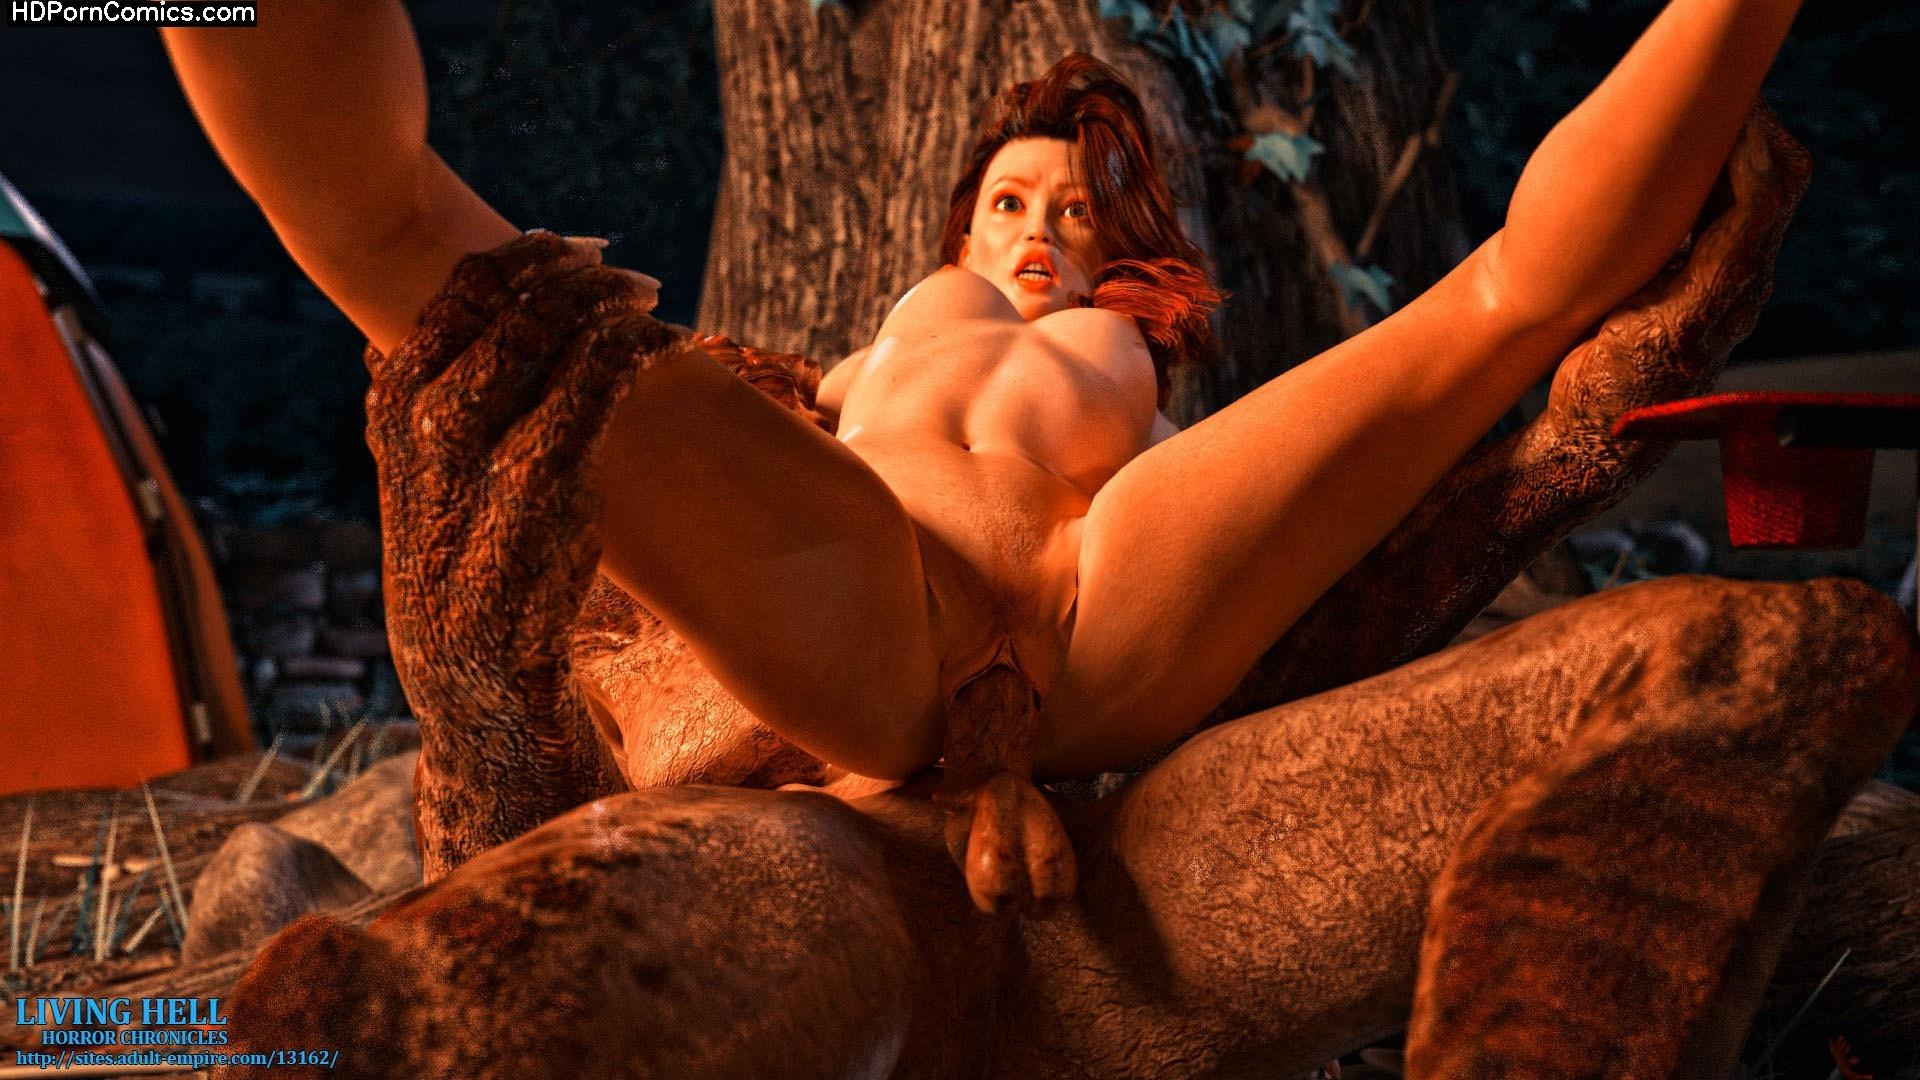 Bree daniels in becoming a porn star